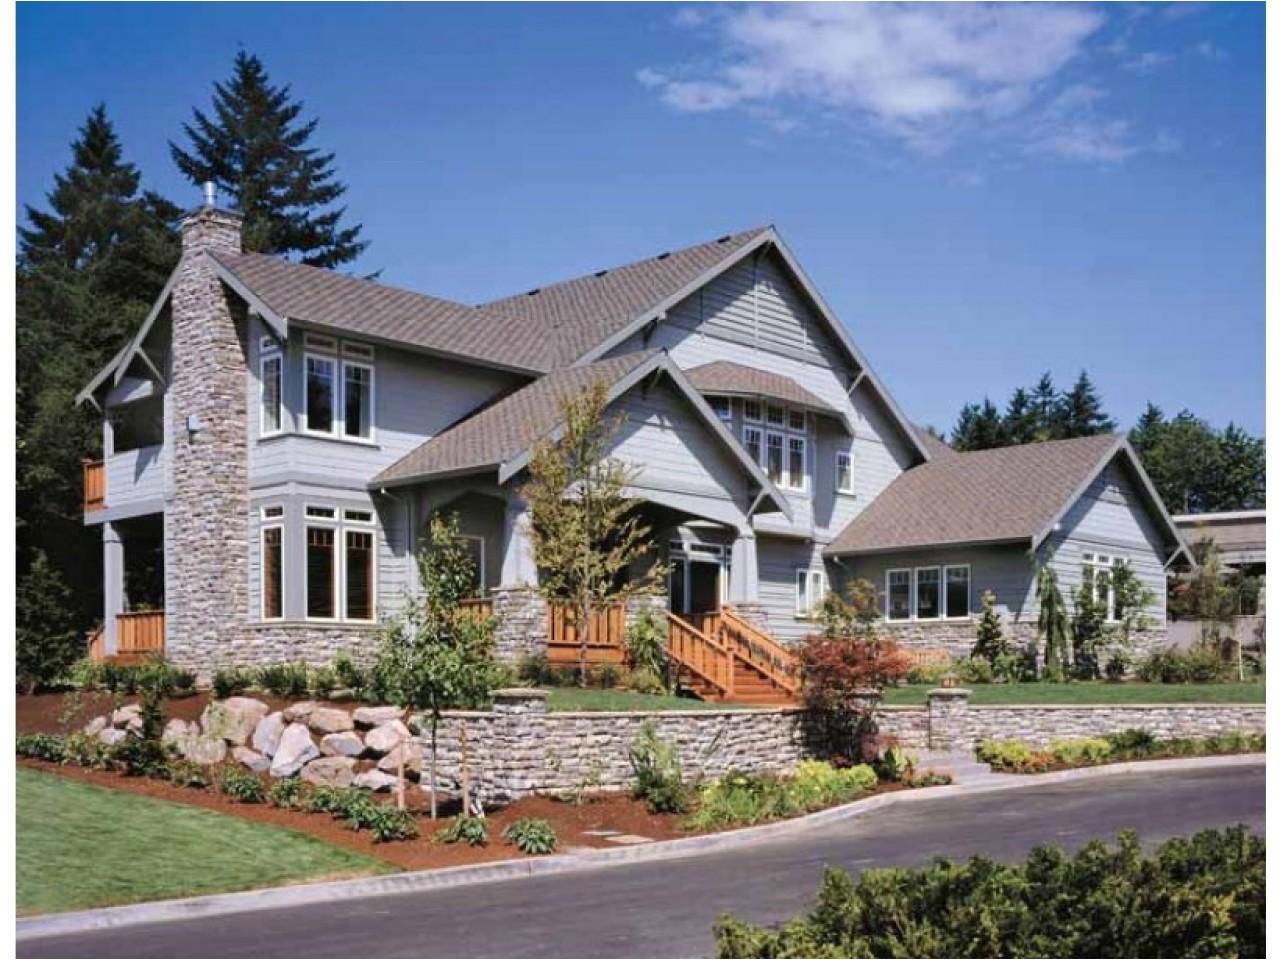 ff96034cade0cb5e craftsman bungalow house plans craftsman style house plans